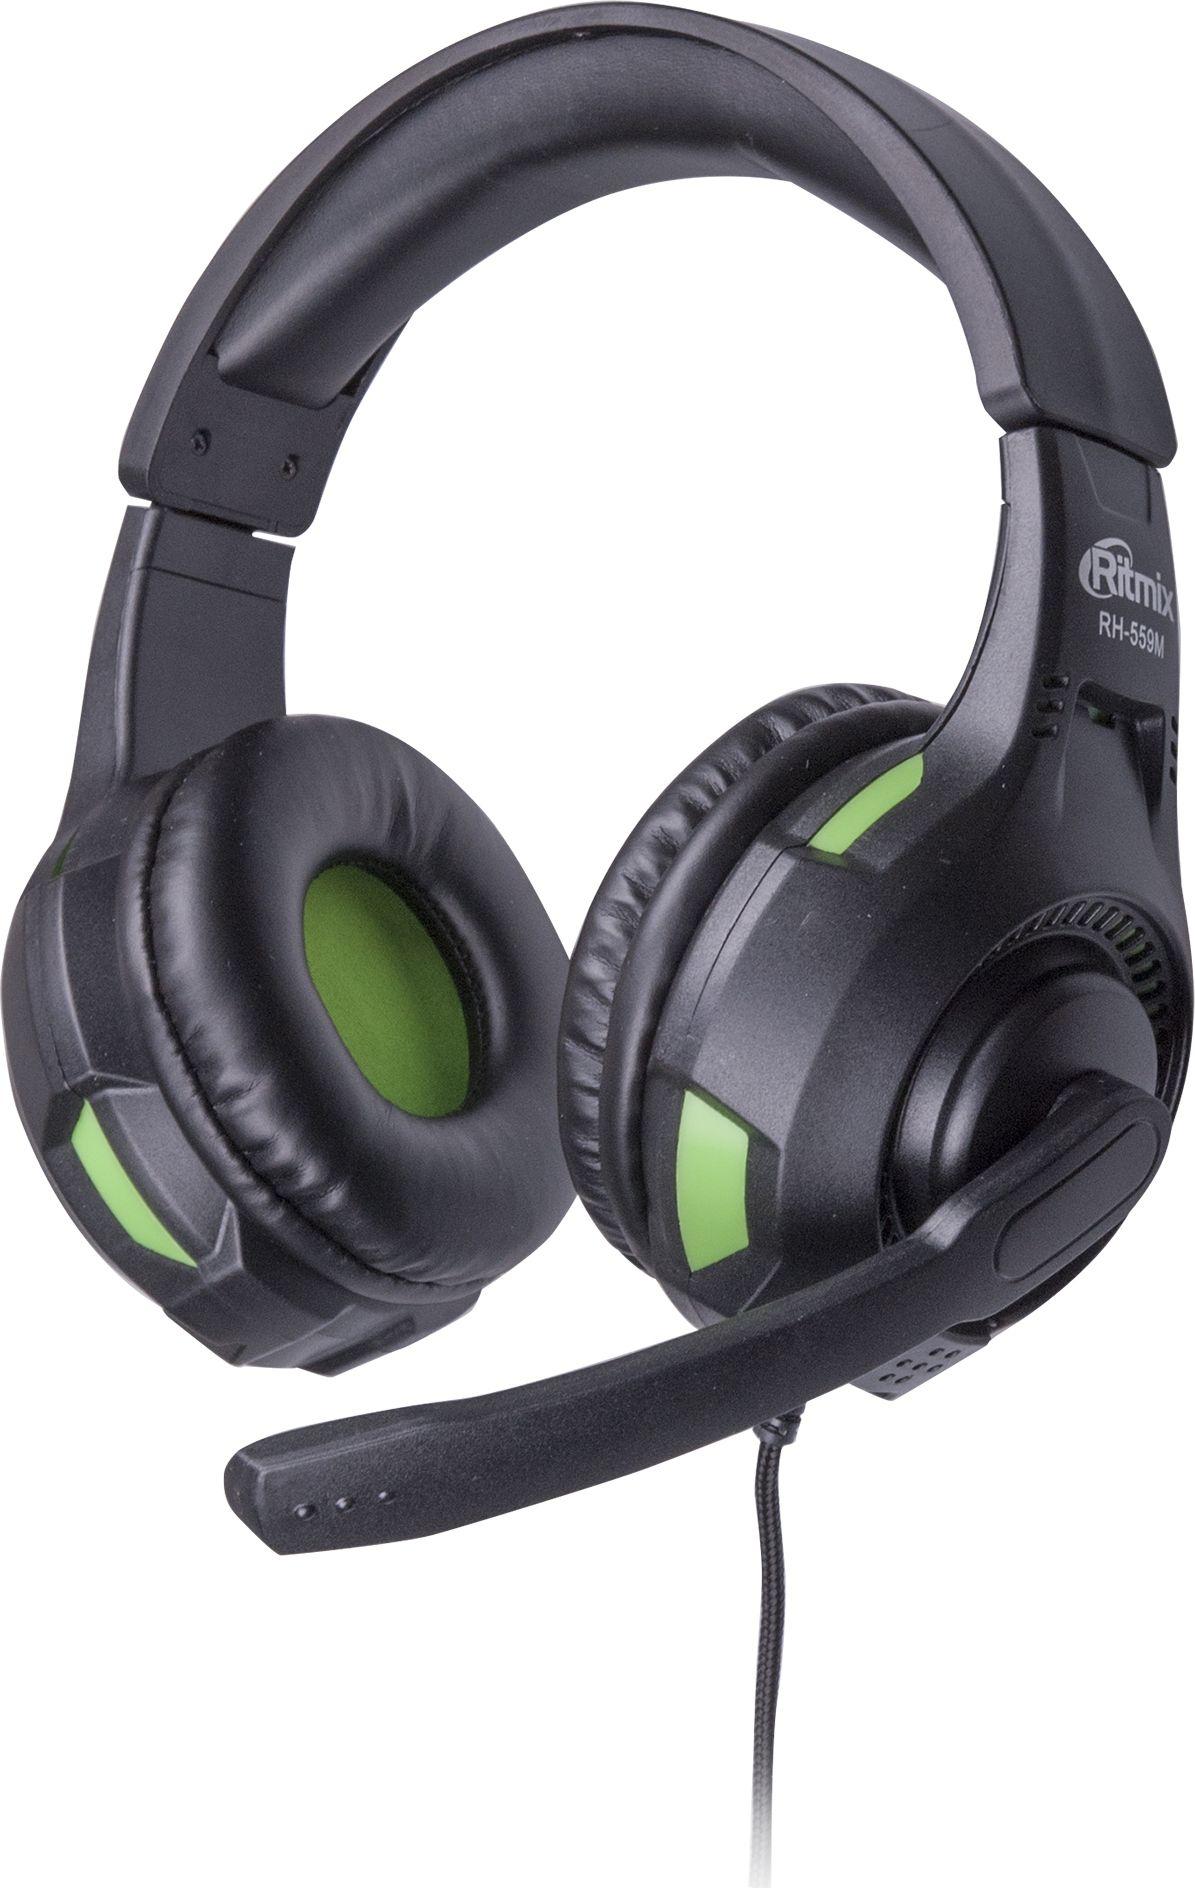 Компьютерная гарнитура Ritmix RH-559M, Gaming цена и фото